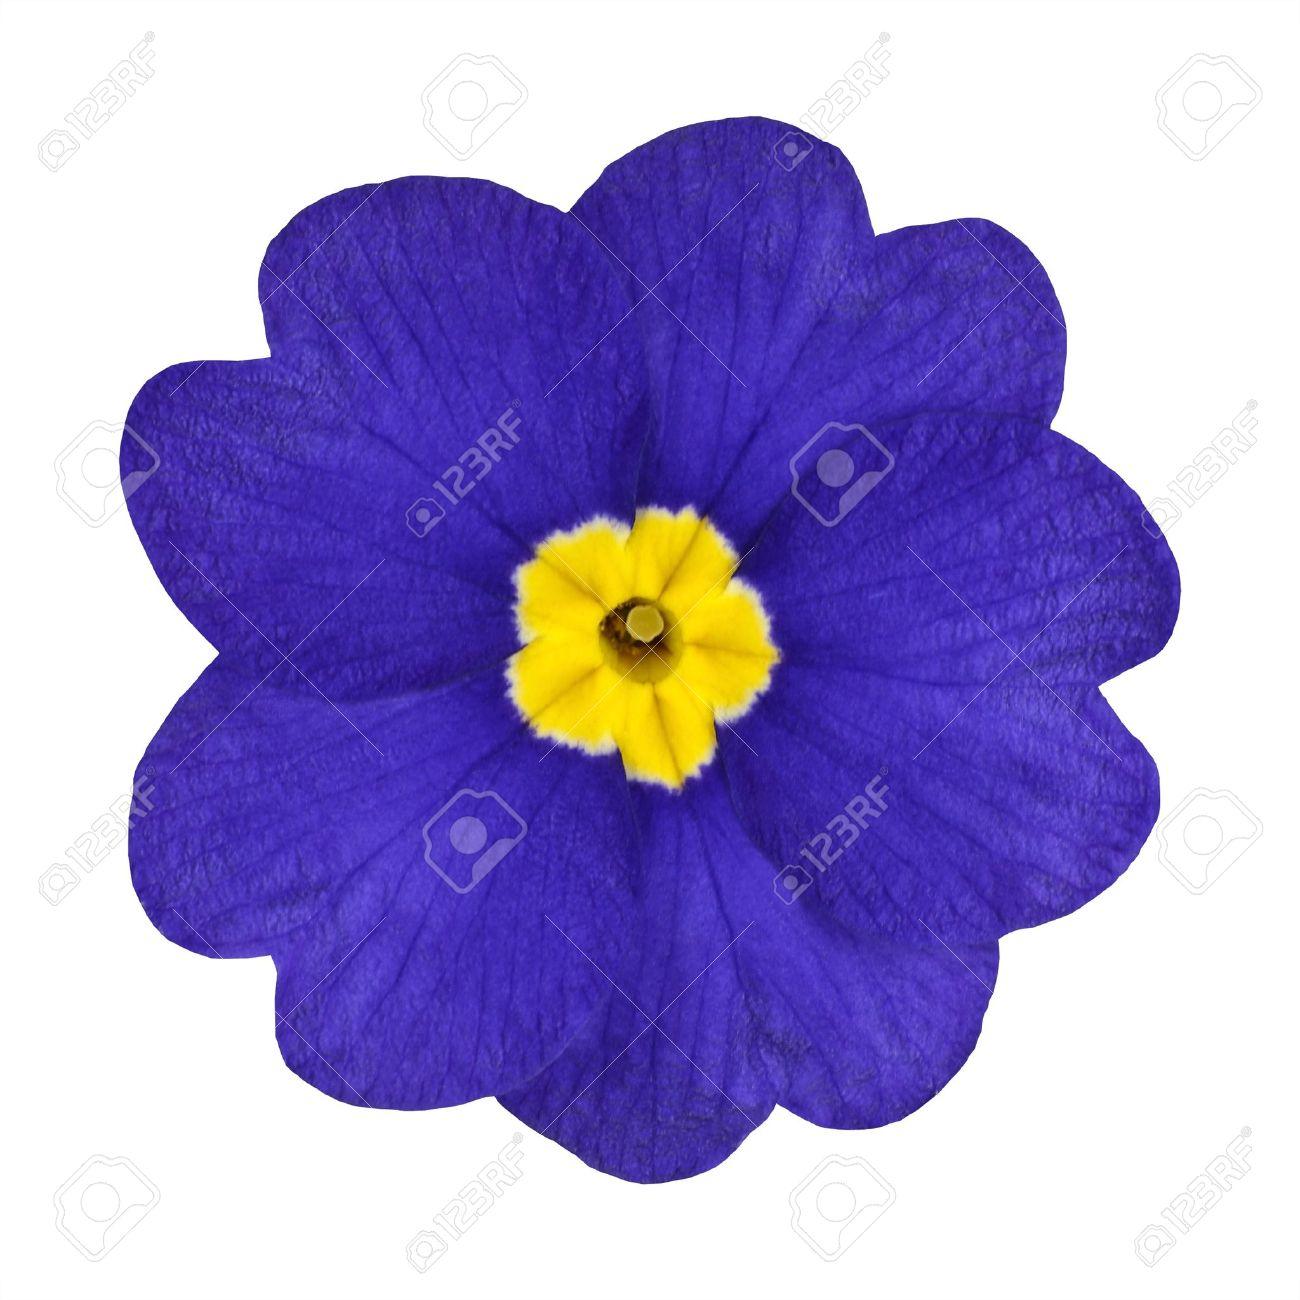 single blue primrose flower